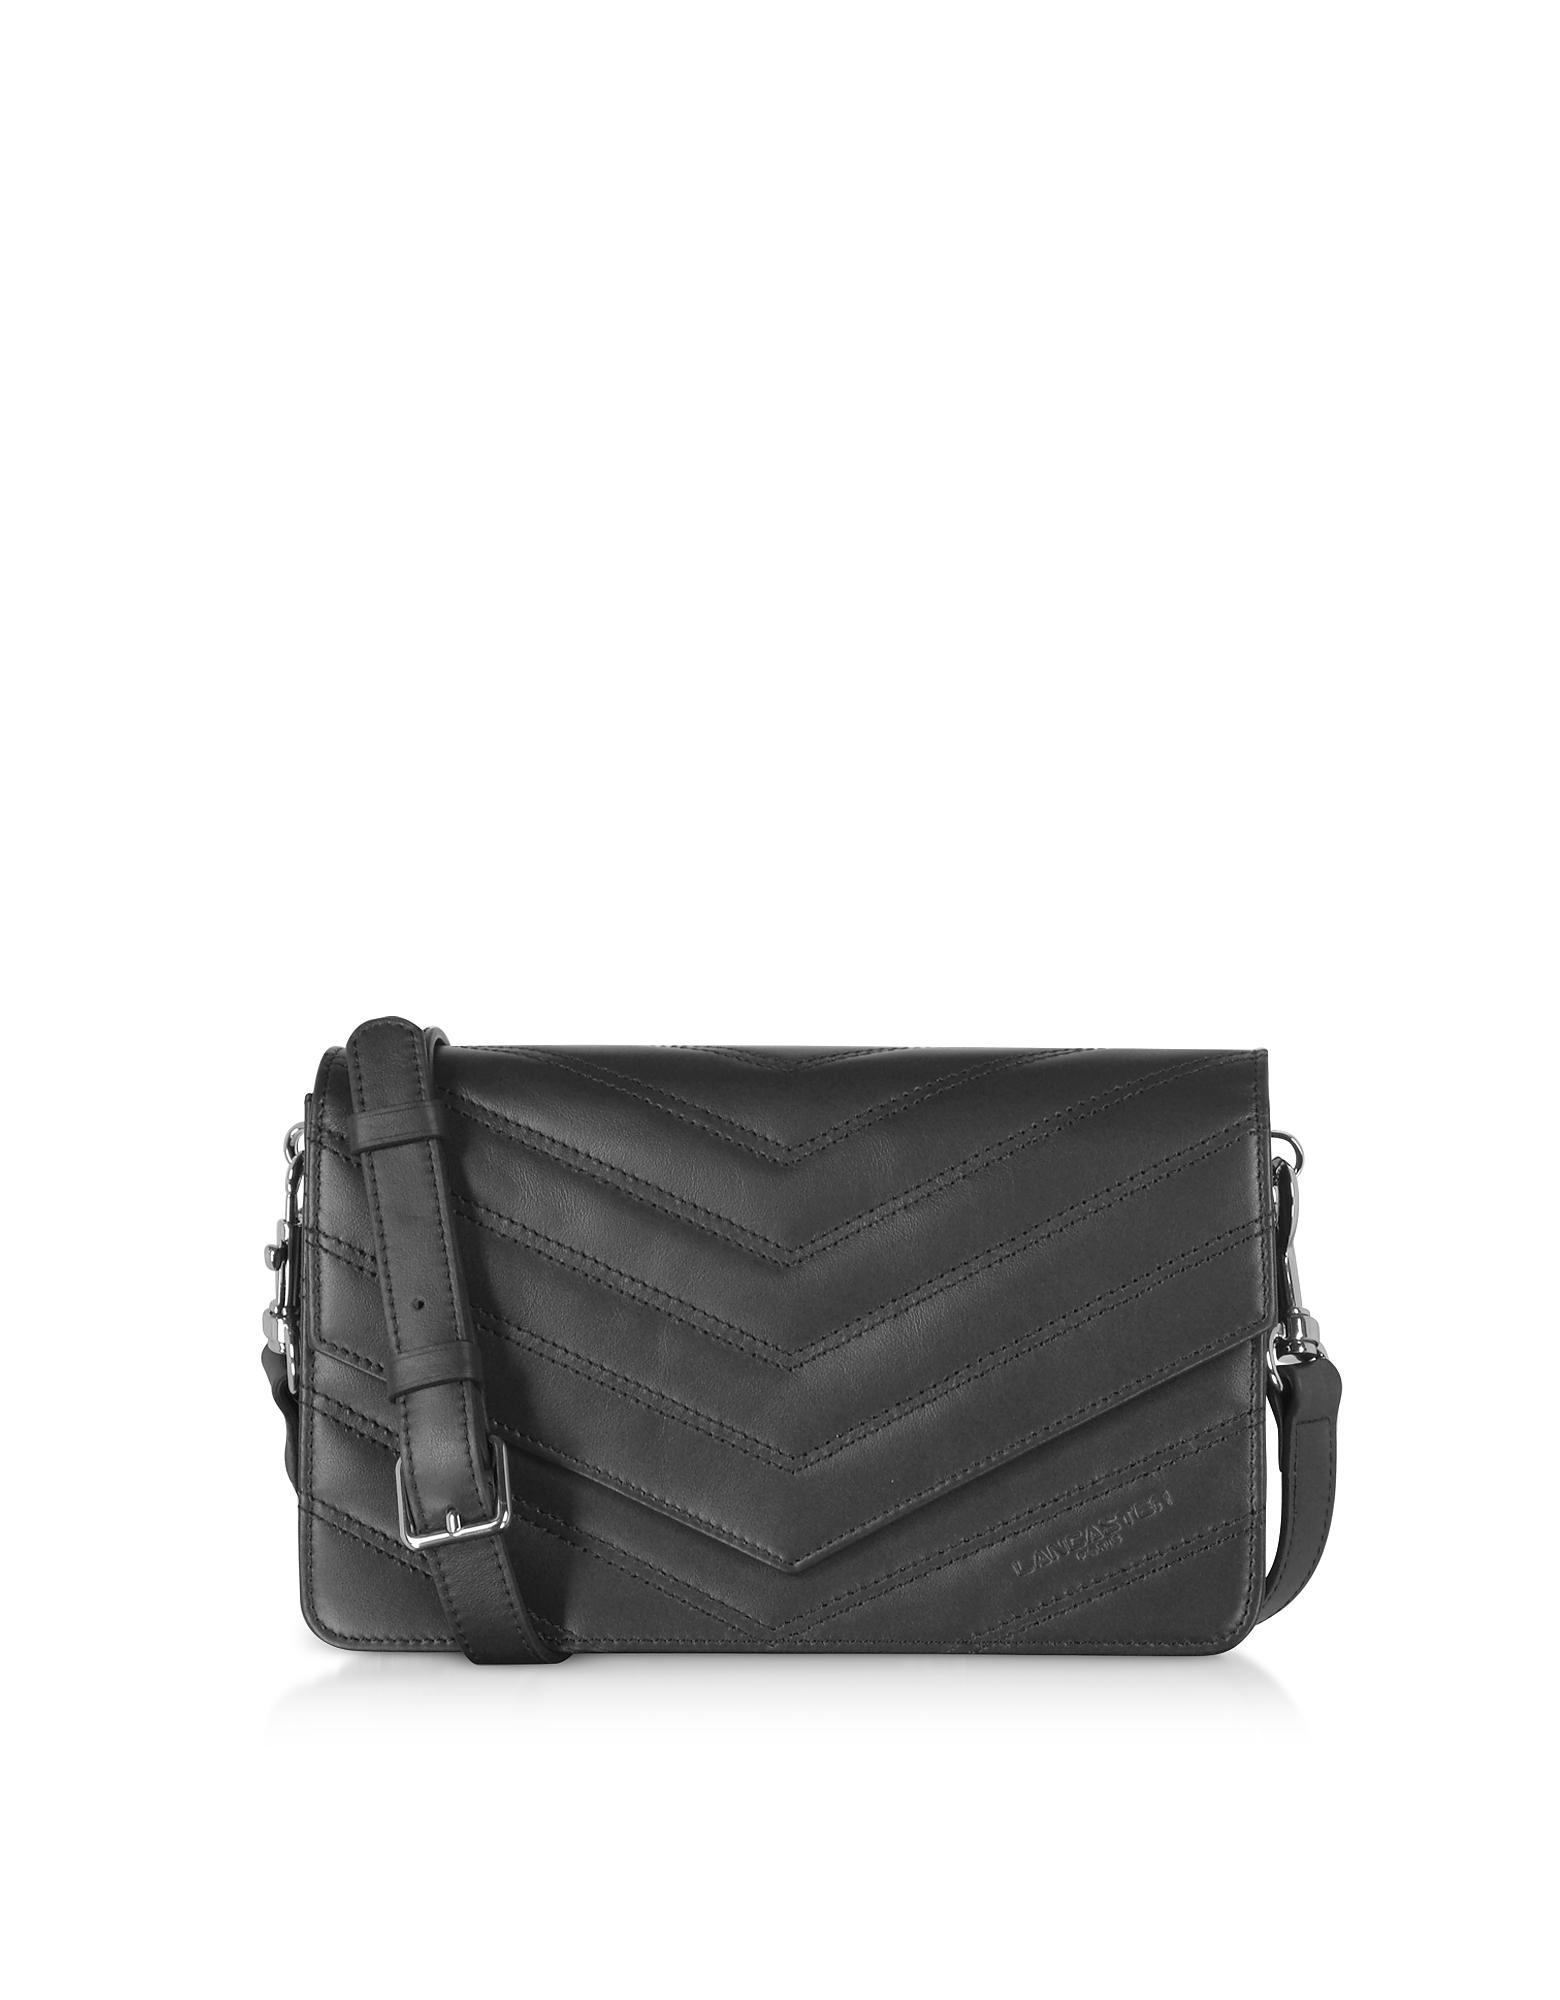 Lancaster Paris Designer Handbags, Parisienne Matelasse Leather Shoulder Bag